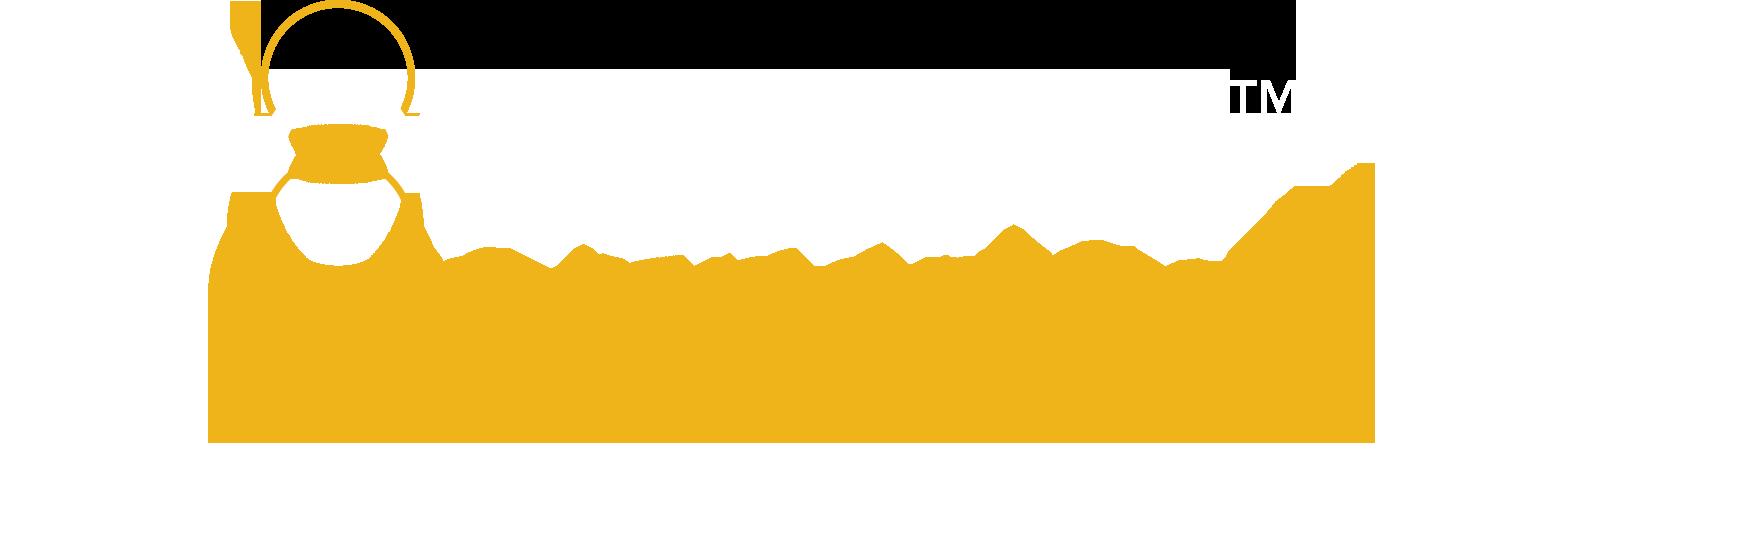 support hub